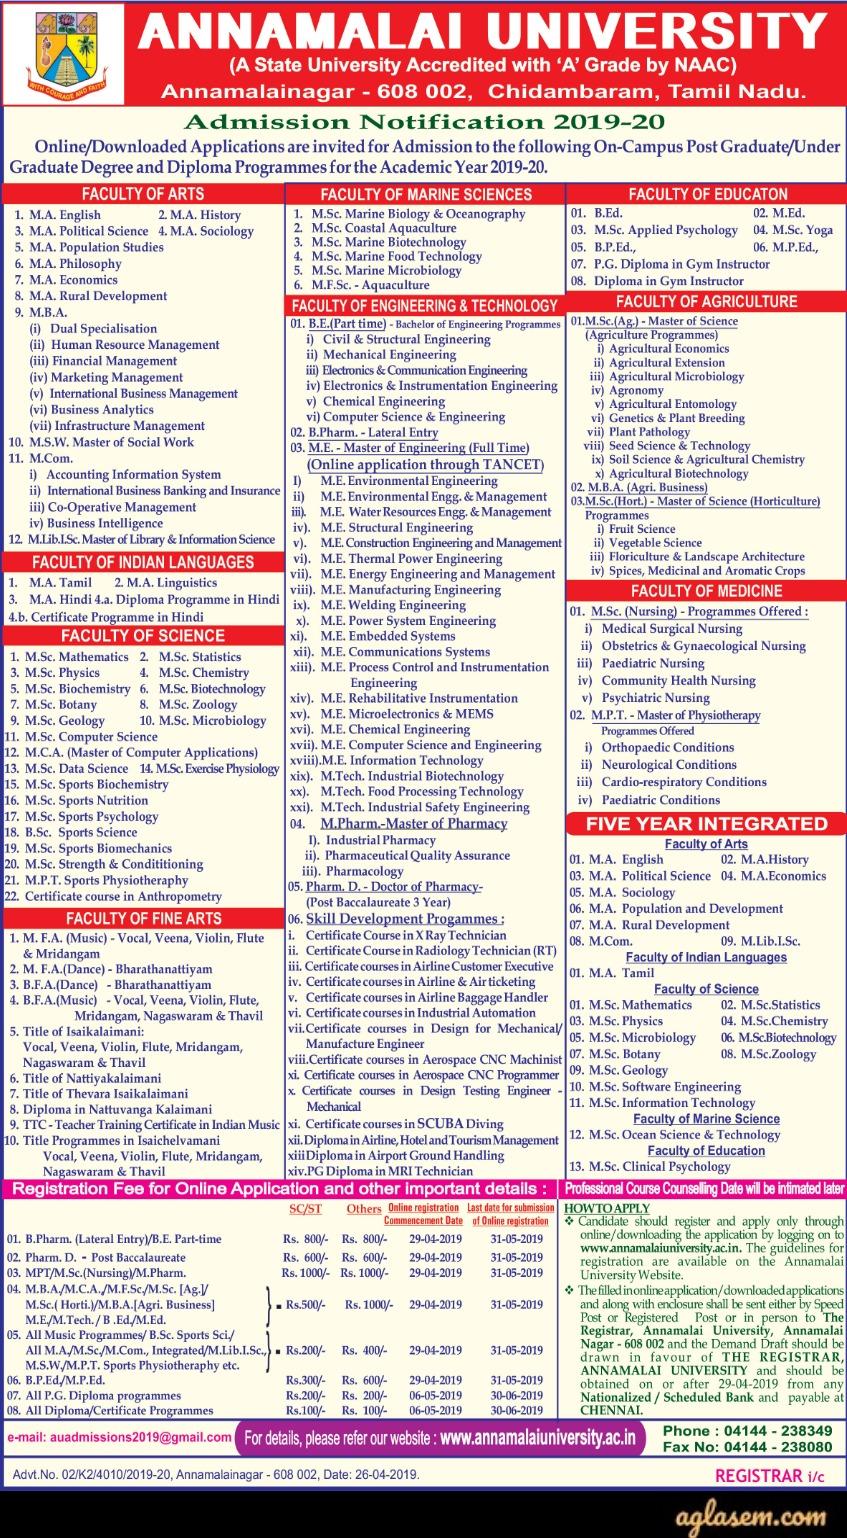 Annamalai University M Ed Admission 2019 - Application Form